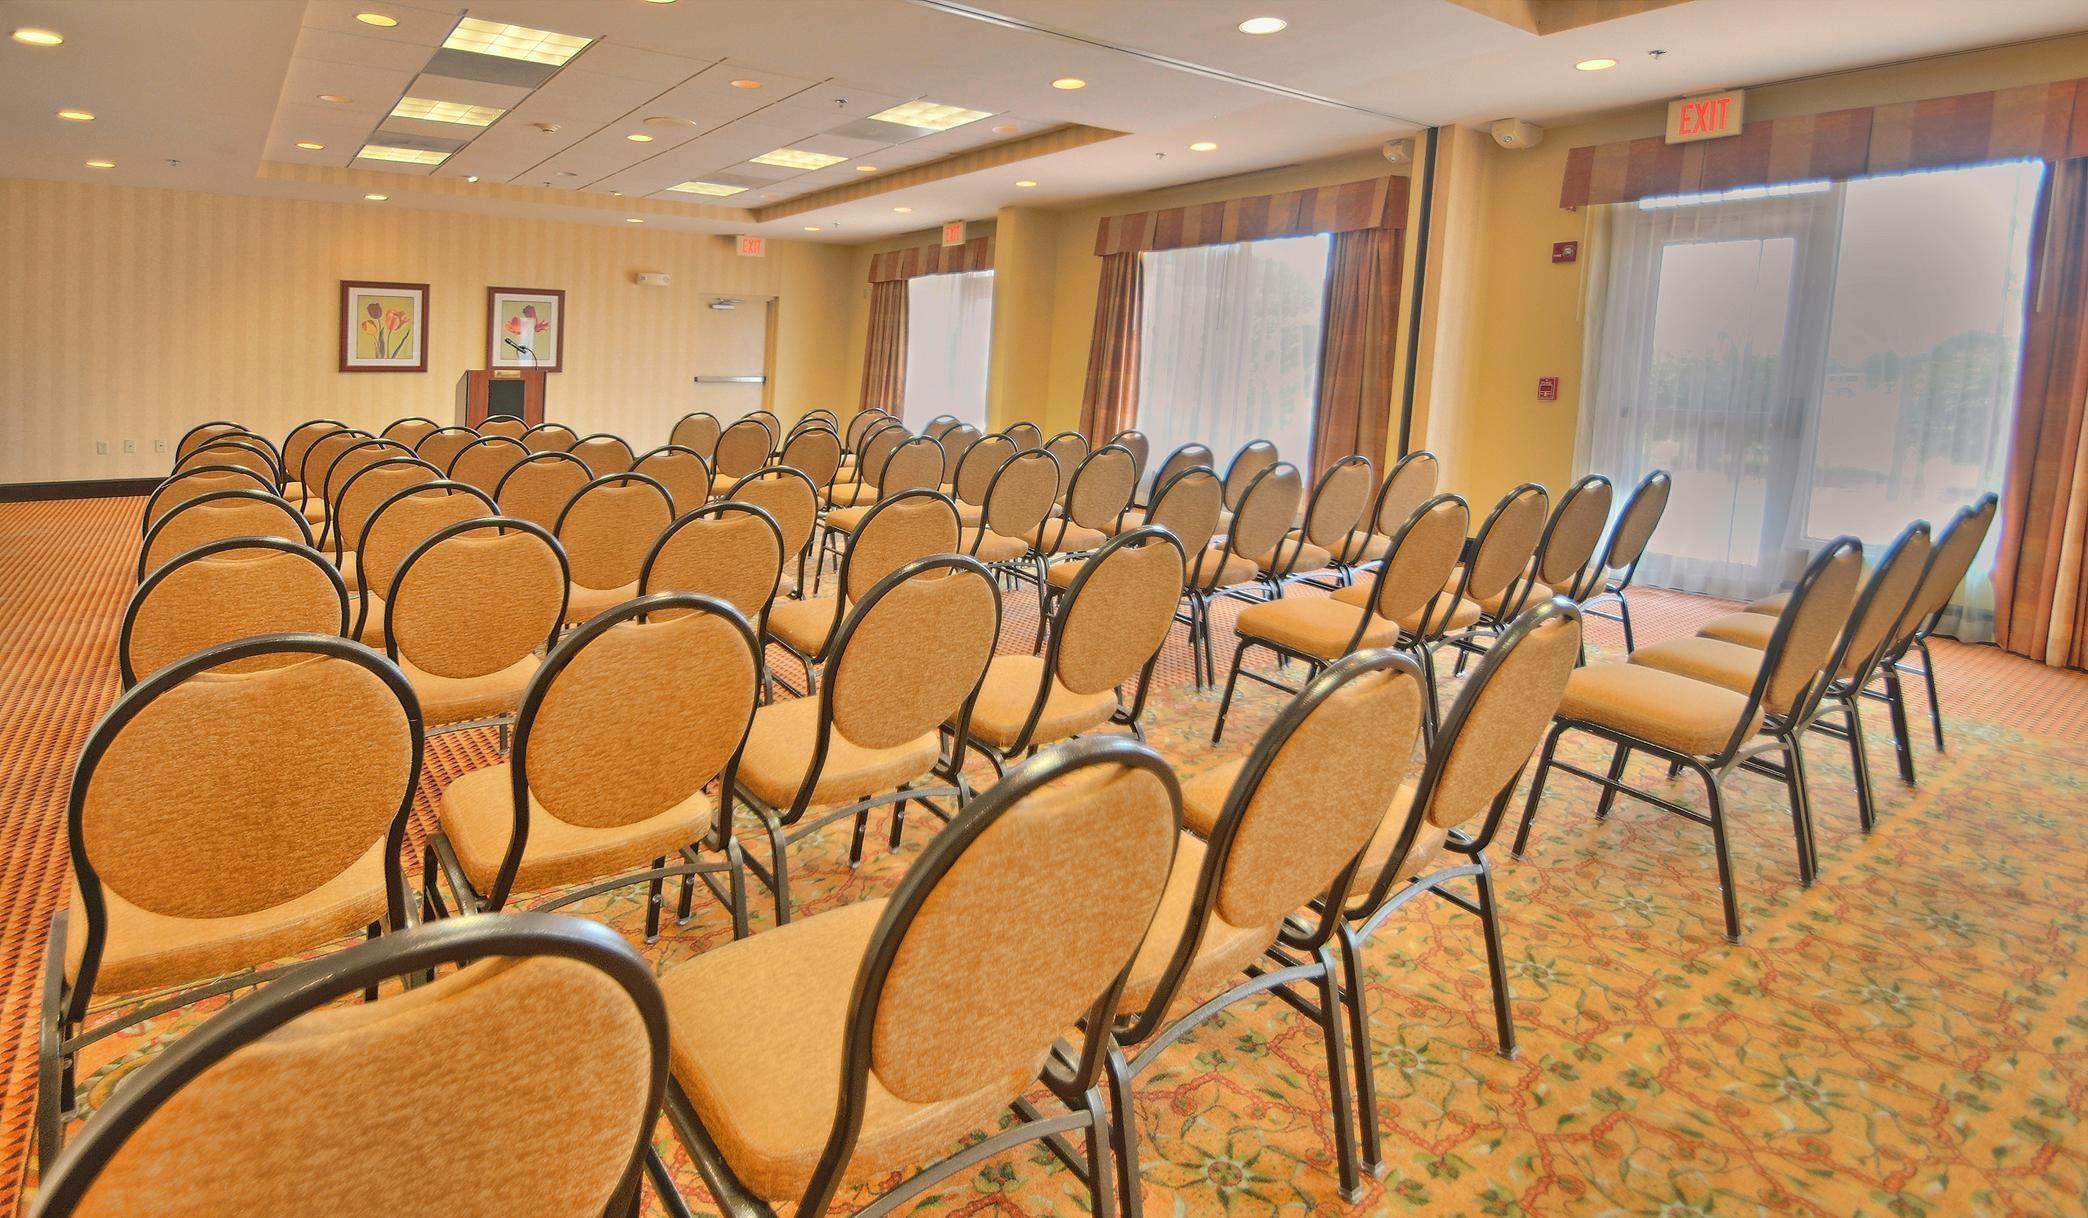 hilton garden inn kankakee 455 riverstone parkway kankakee il hotels motels mapquest - Hilton Garden Inn Kankakee